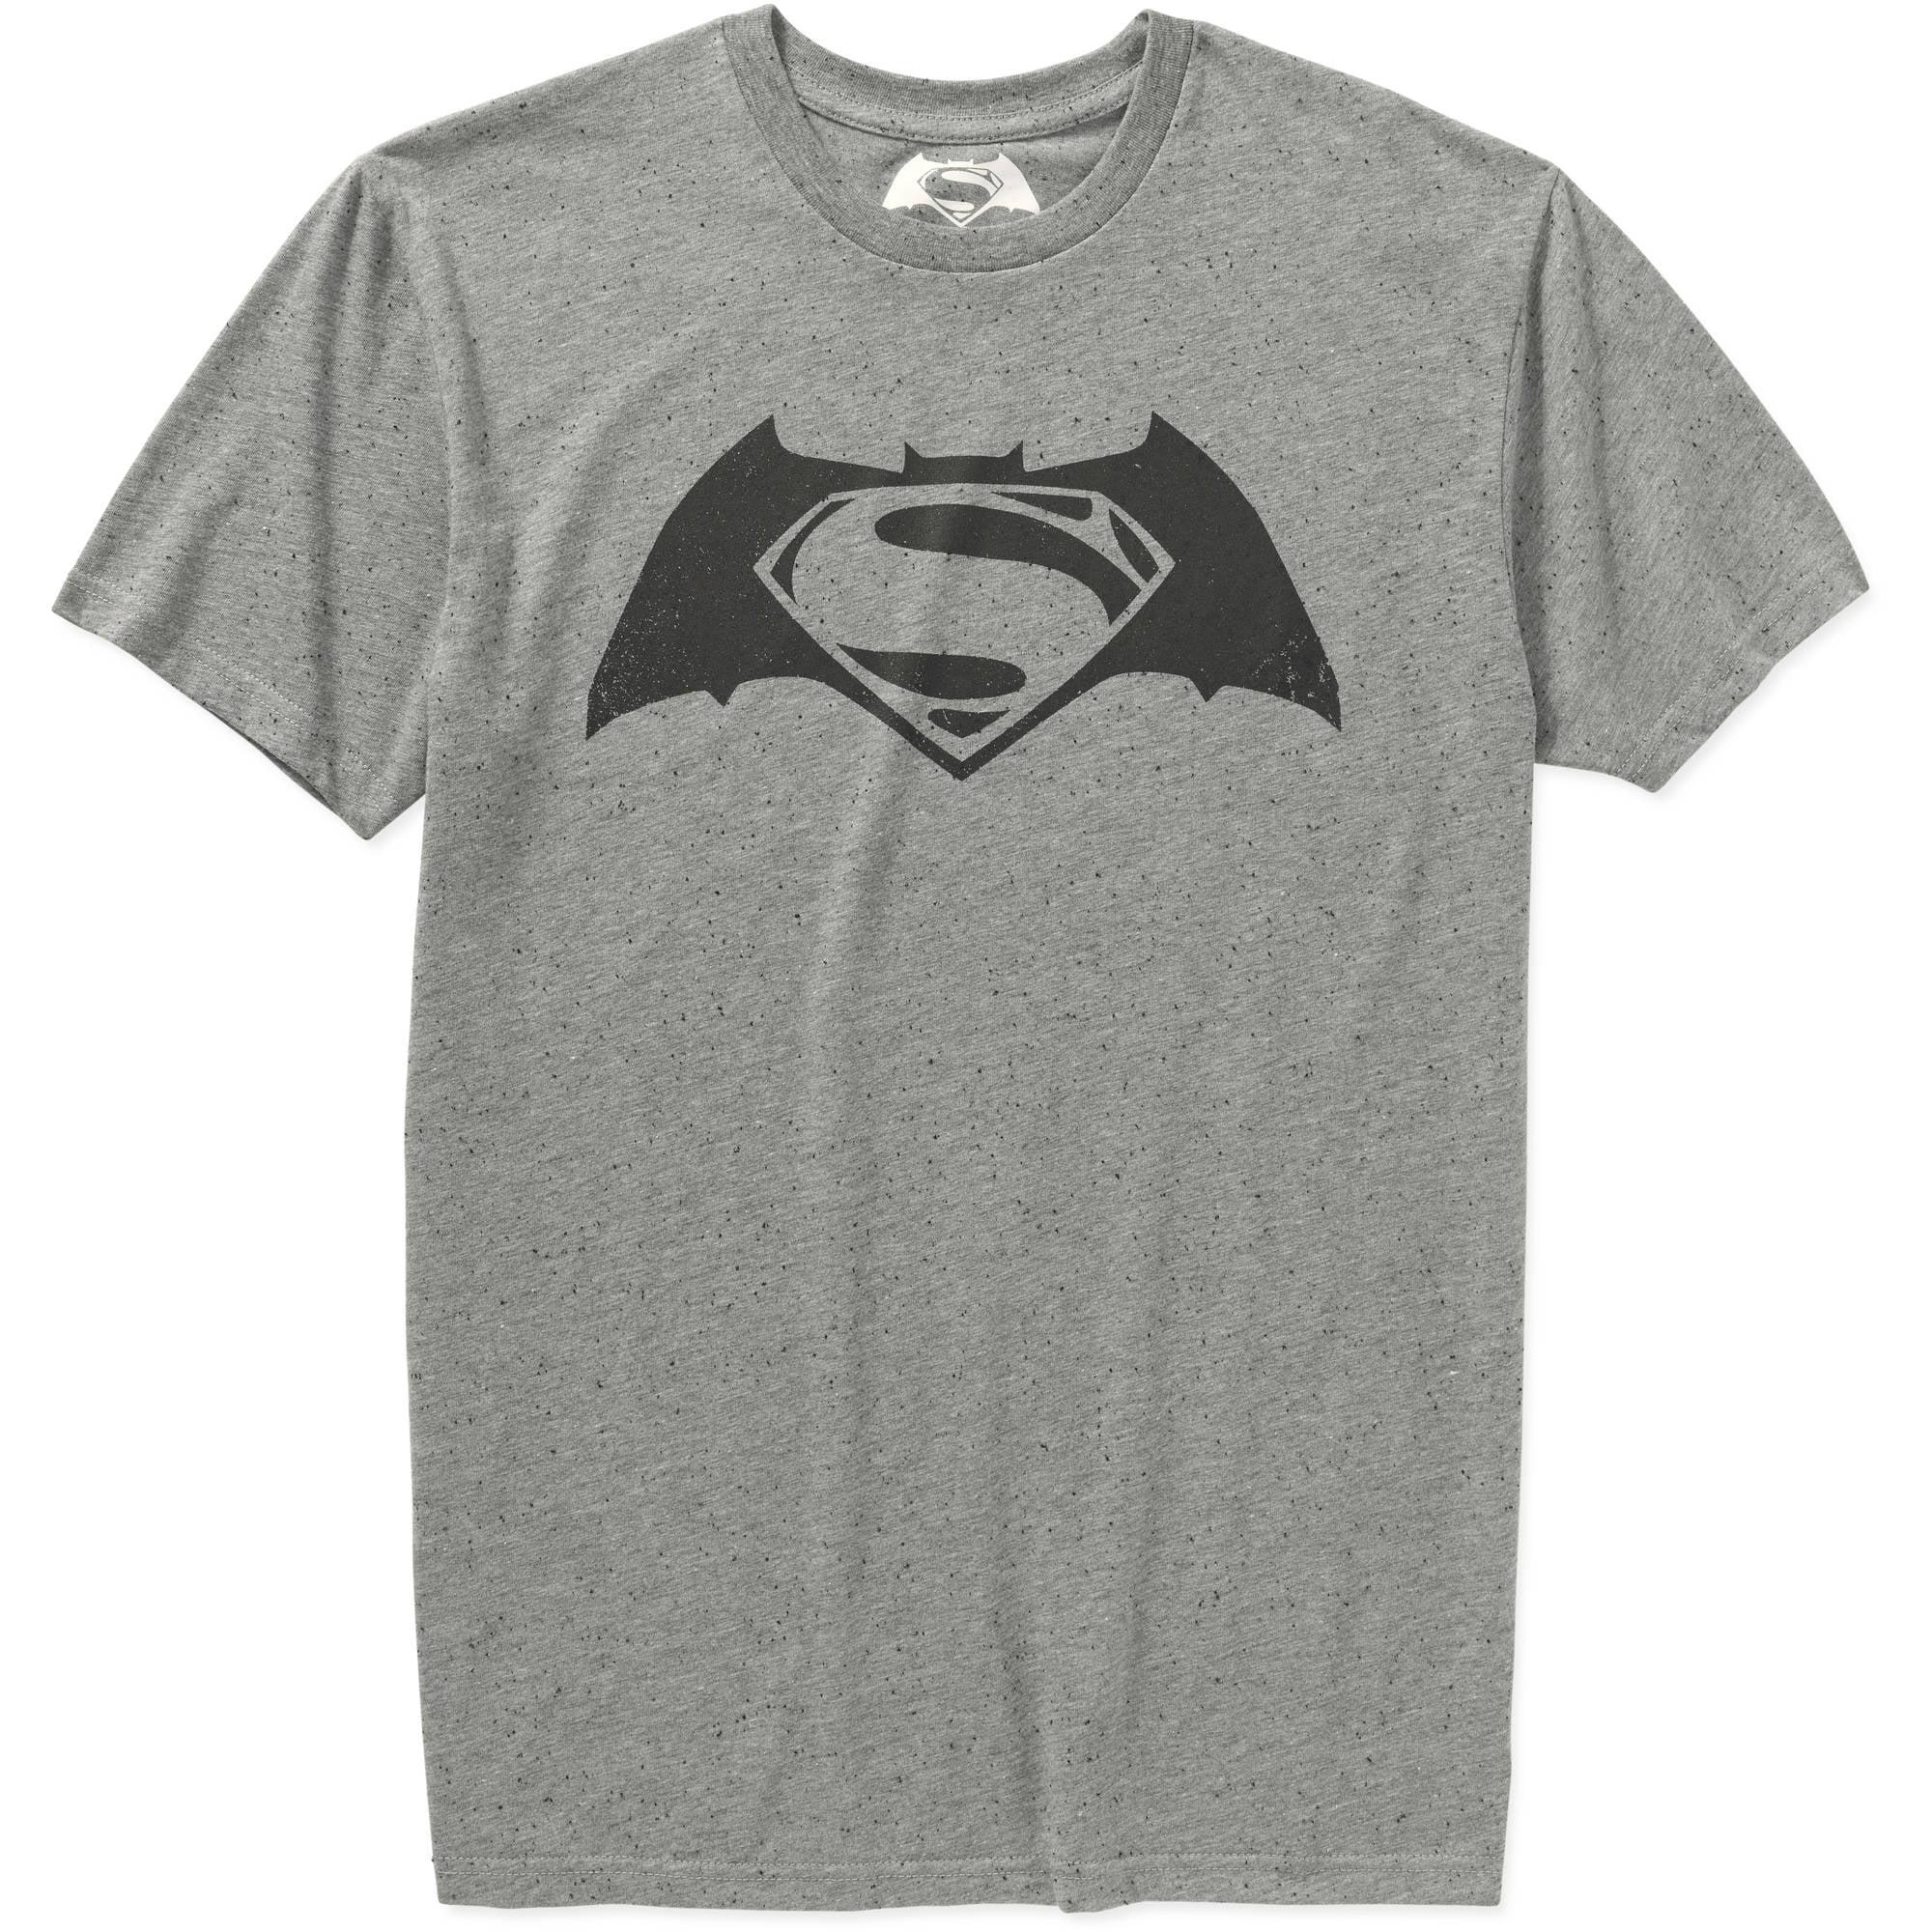 Batman vs. Superman Men's Graphic Tee